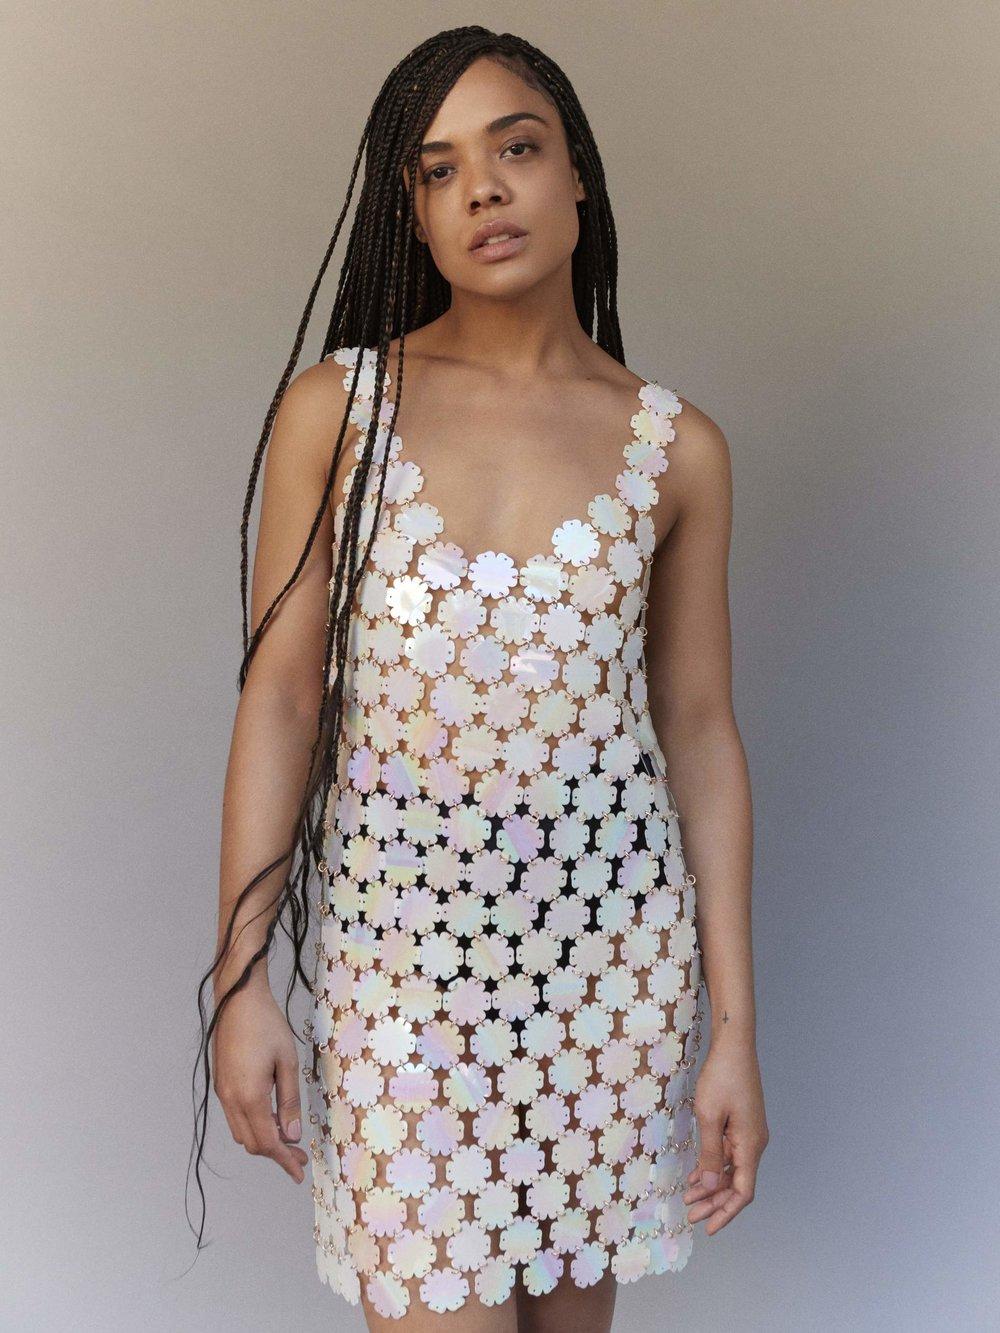 TESSA THOMPSON - Dress Paco Rabanne; briefs Baserange